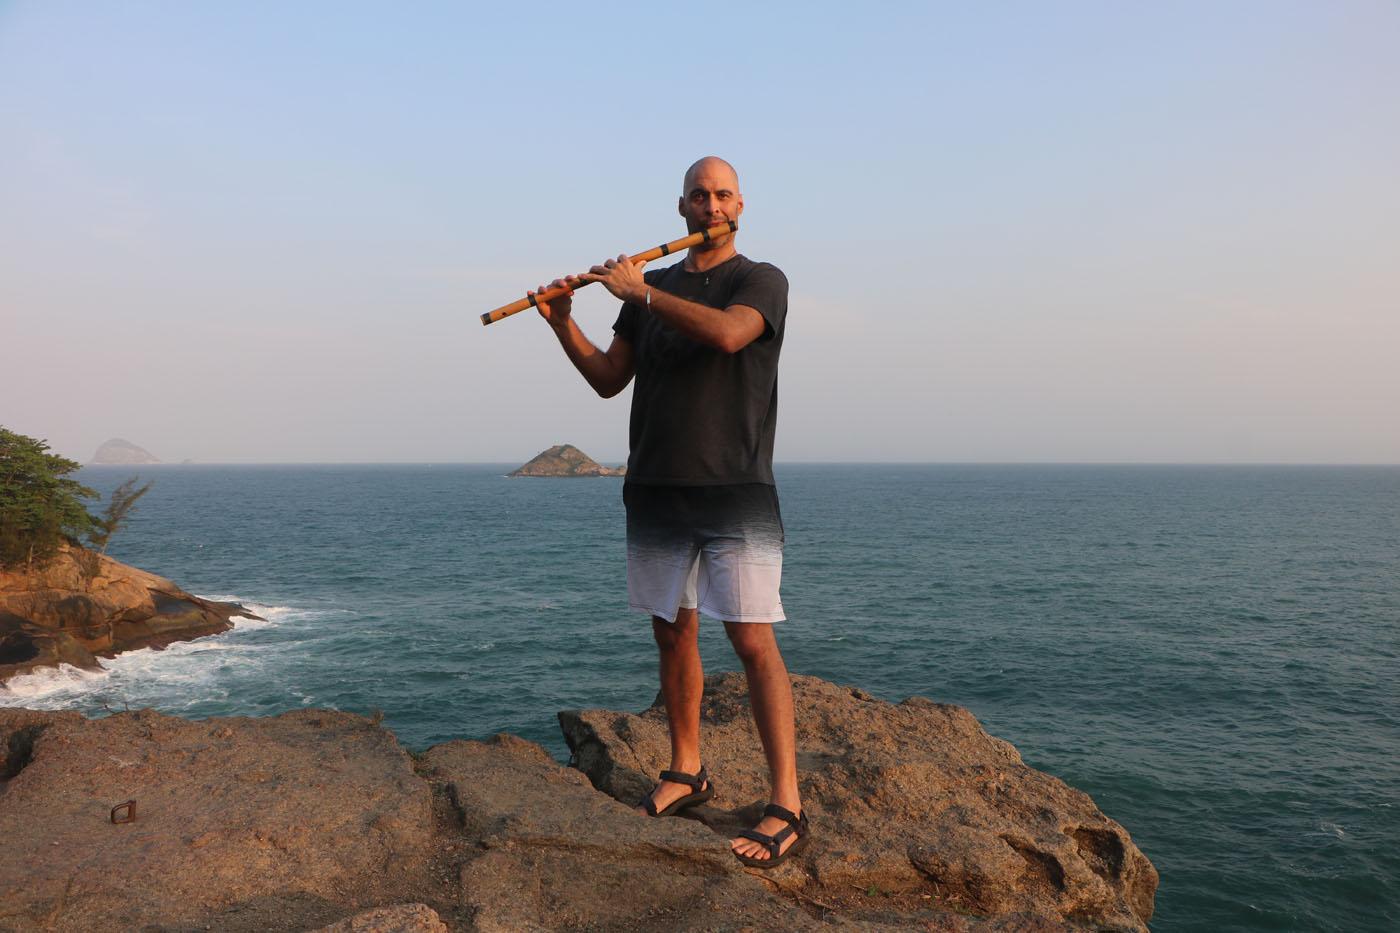 Brazil Joatinga Rio de Janeiro Bansuri Kerry Kriger Ocean